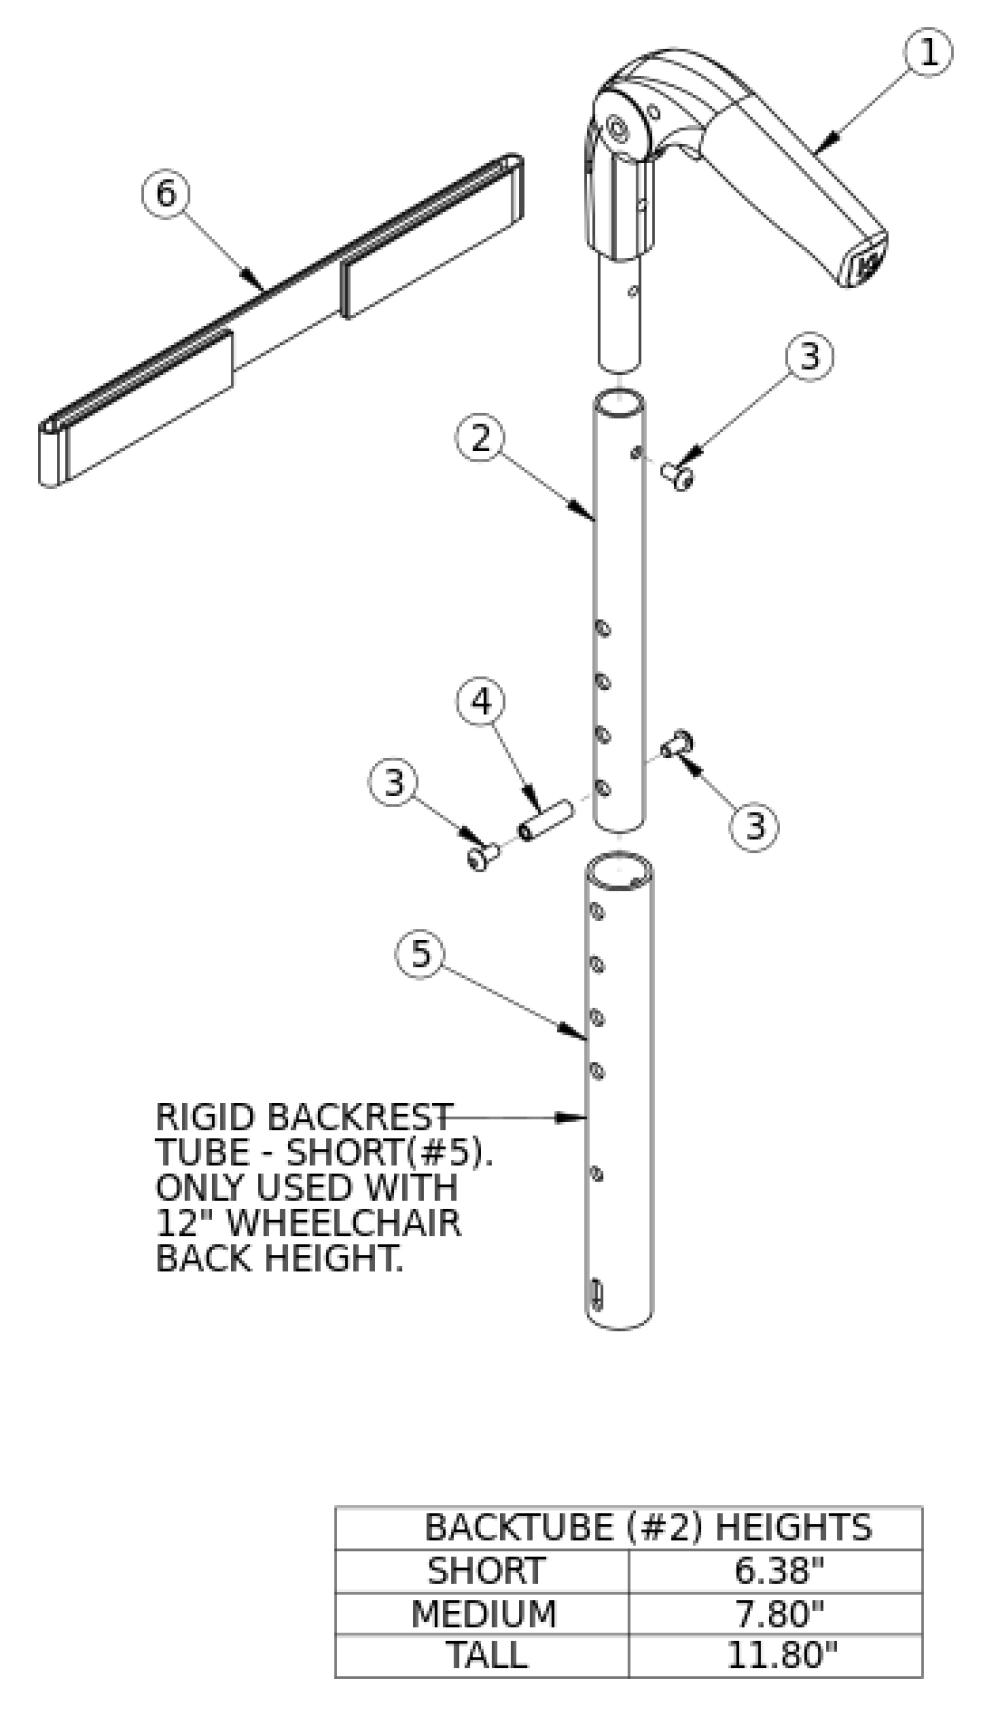 (discontinued) Rogue Fold Down Push Handle parts diagram